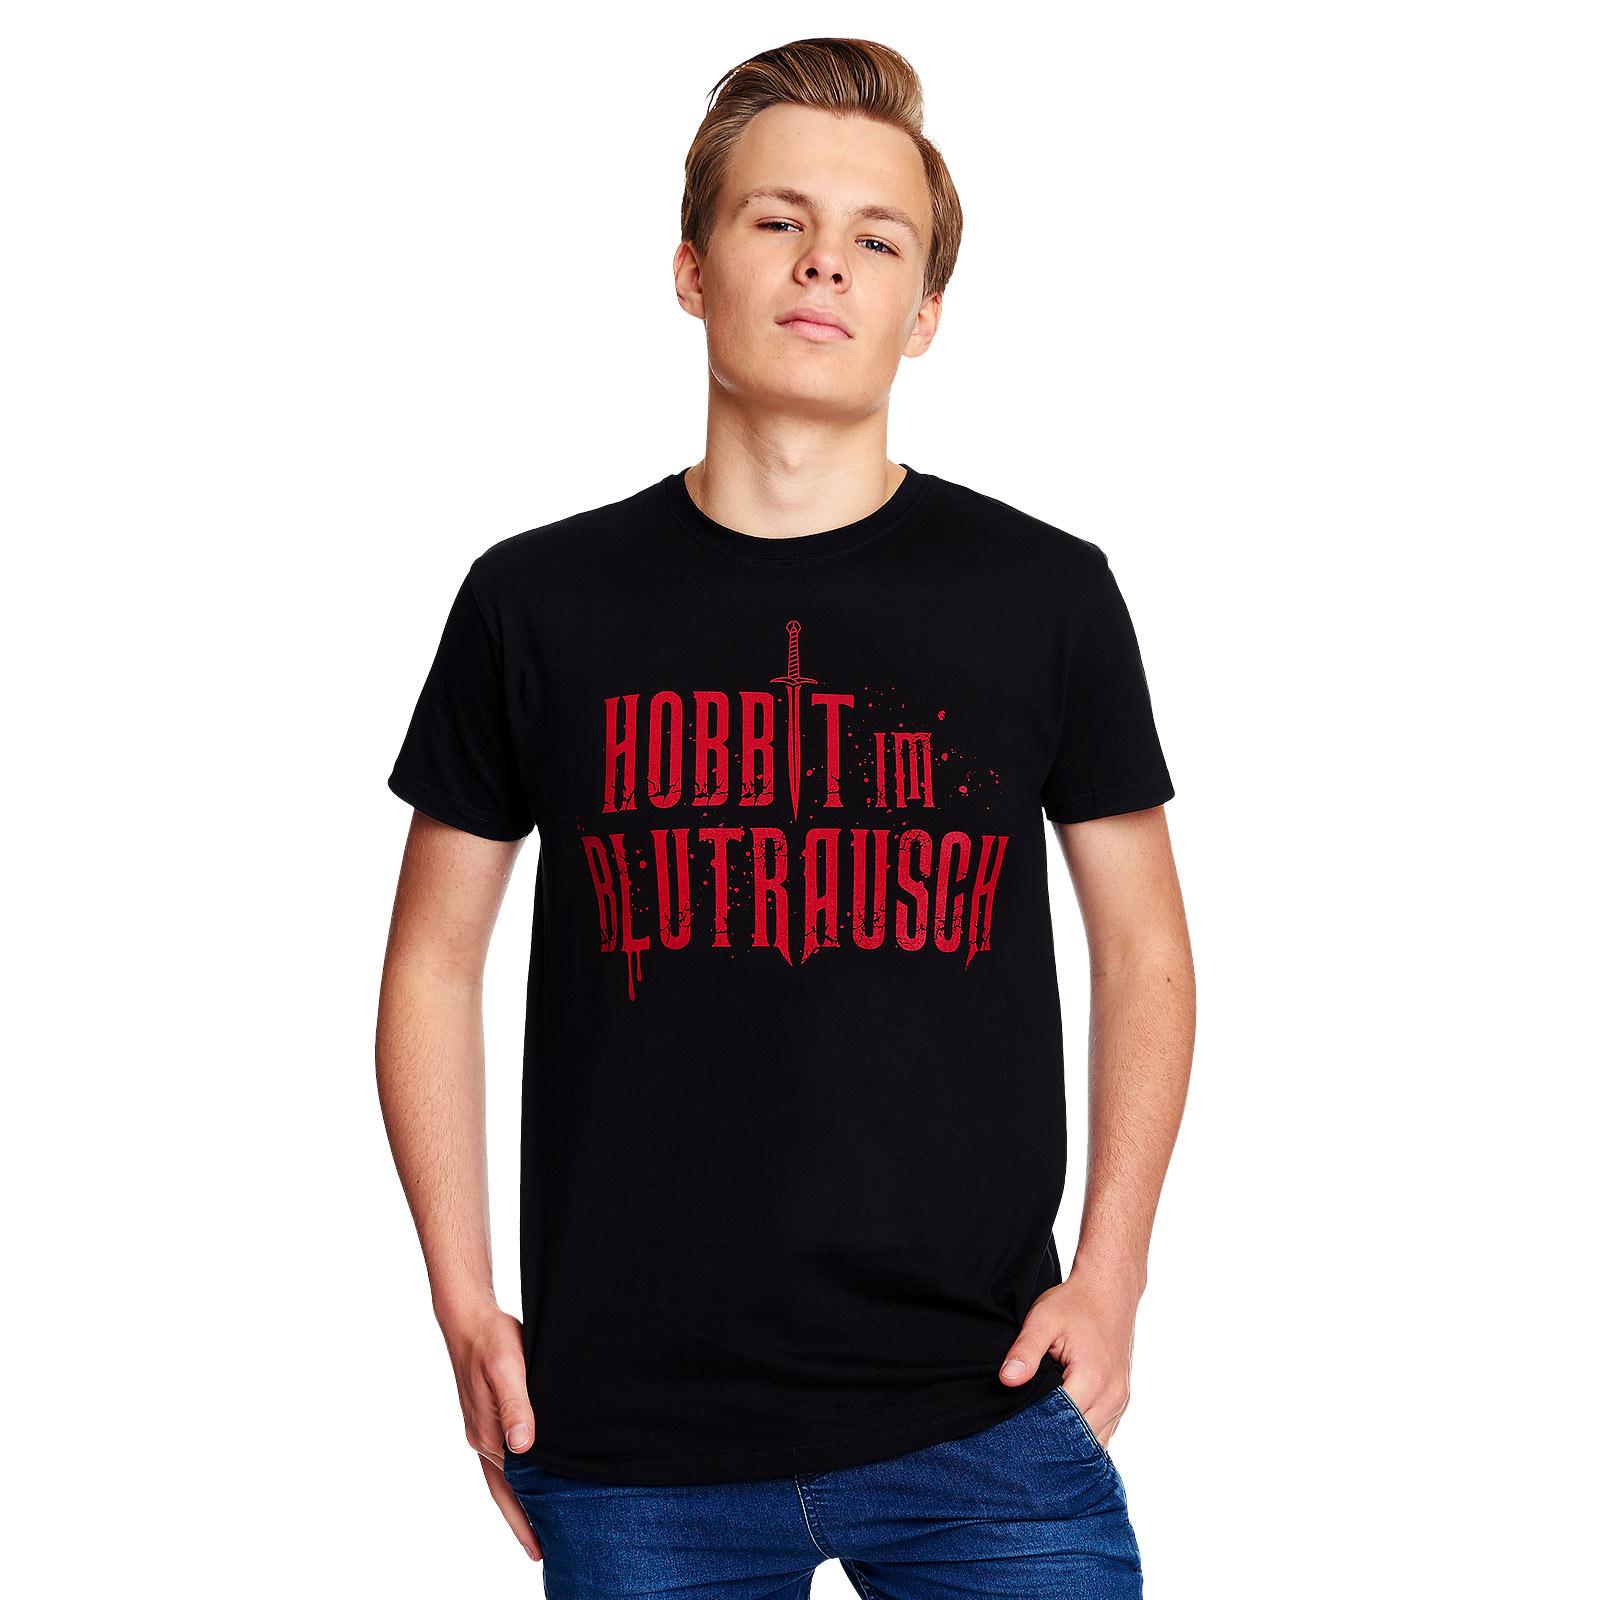 Blutrausch T-Shirt schwarz